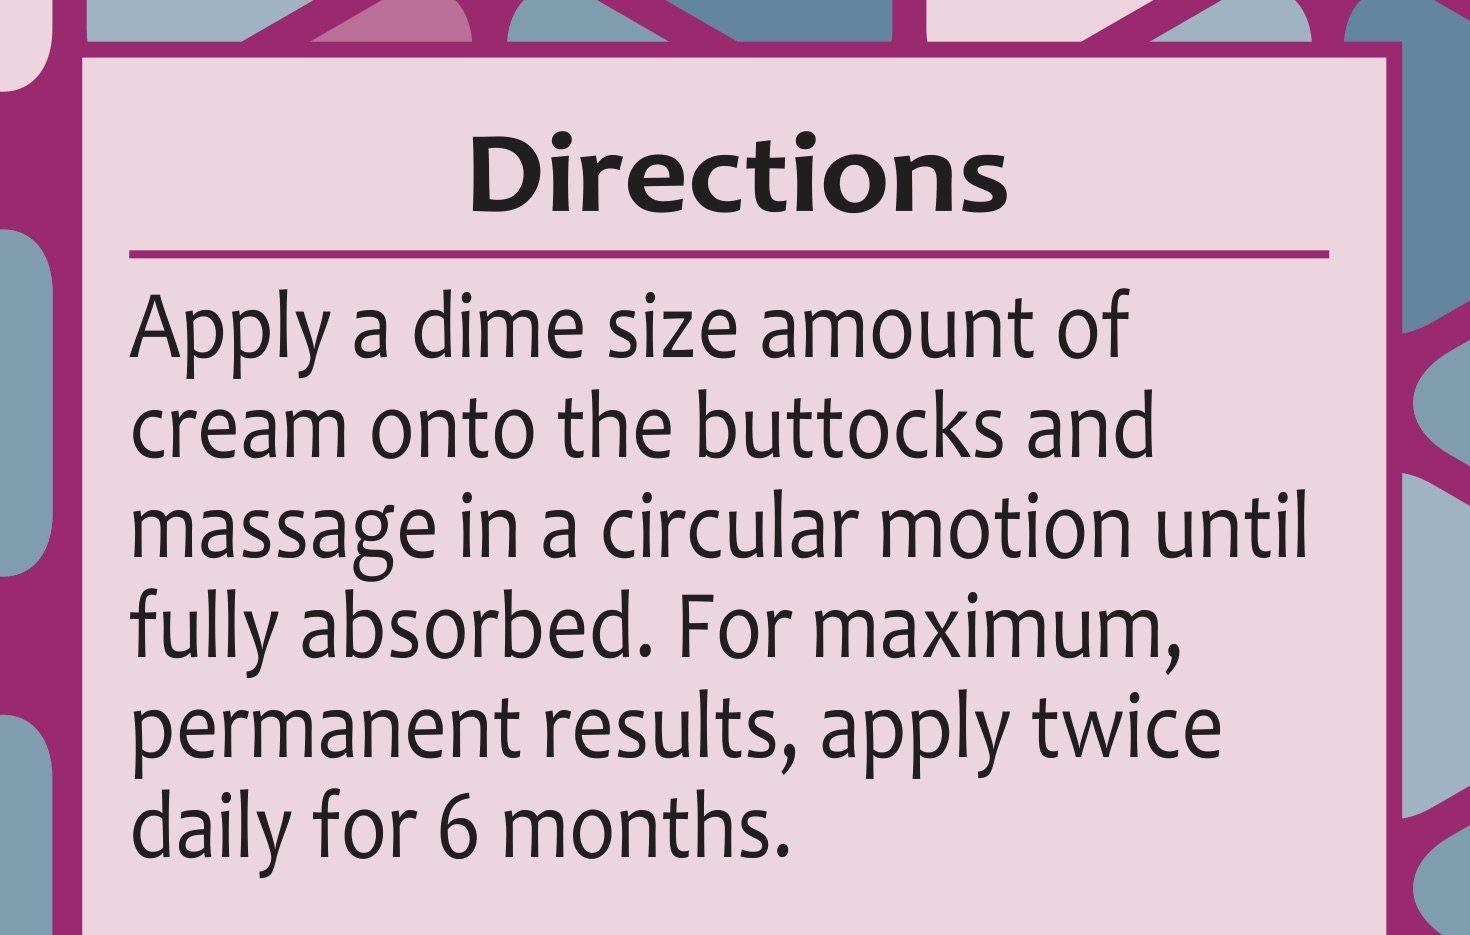 Major Curves Vs Isosensuals - Amazon com booty magic butt enhancement cream 2 month supply beauty